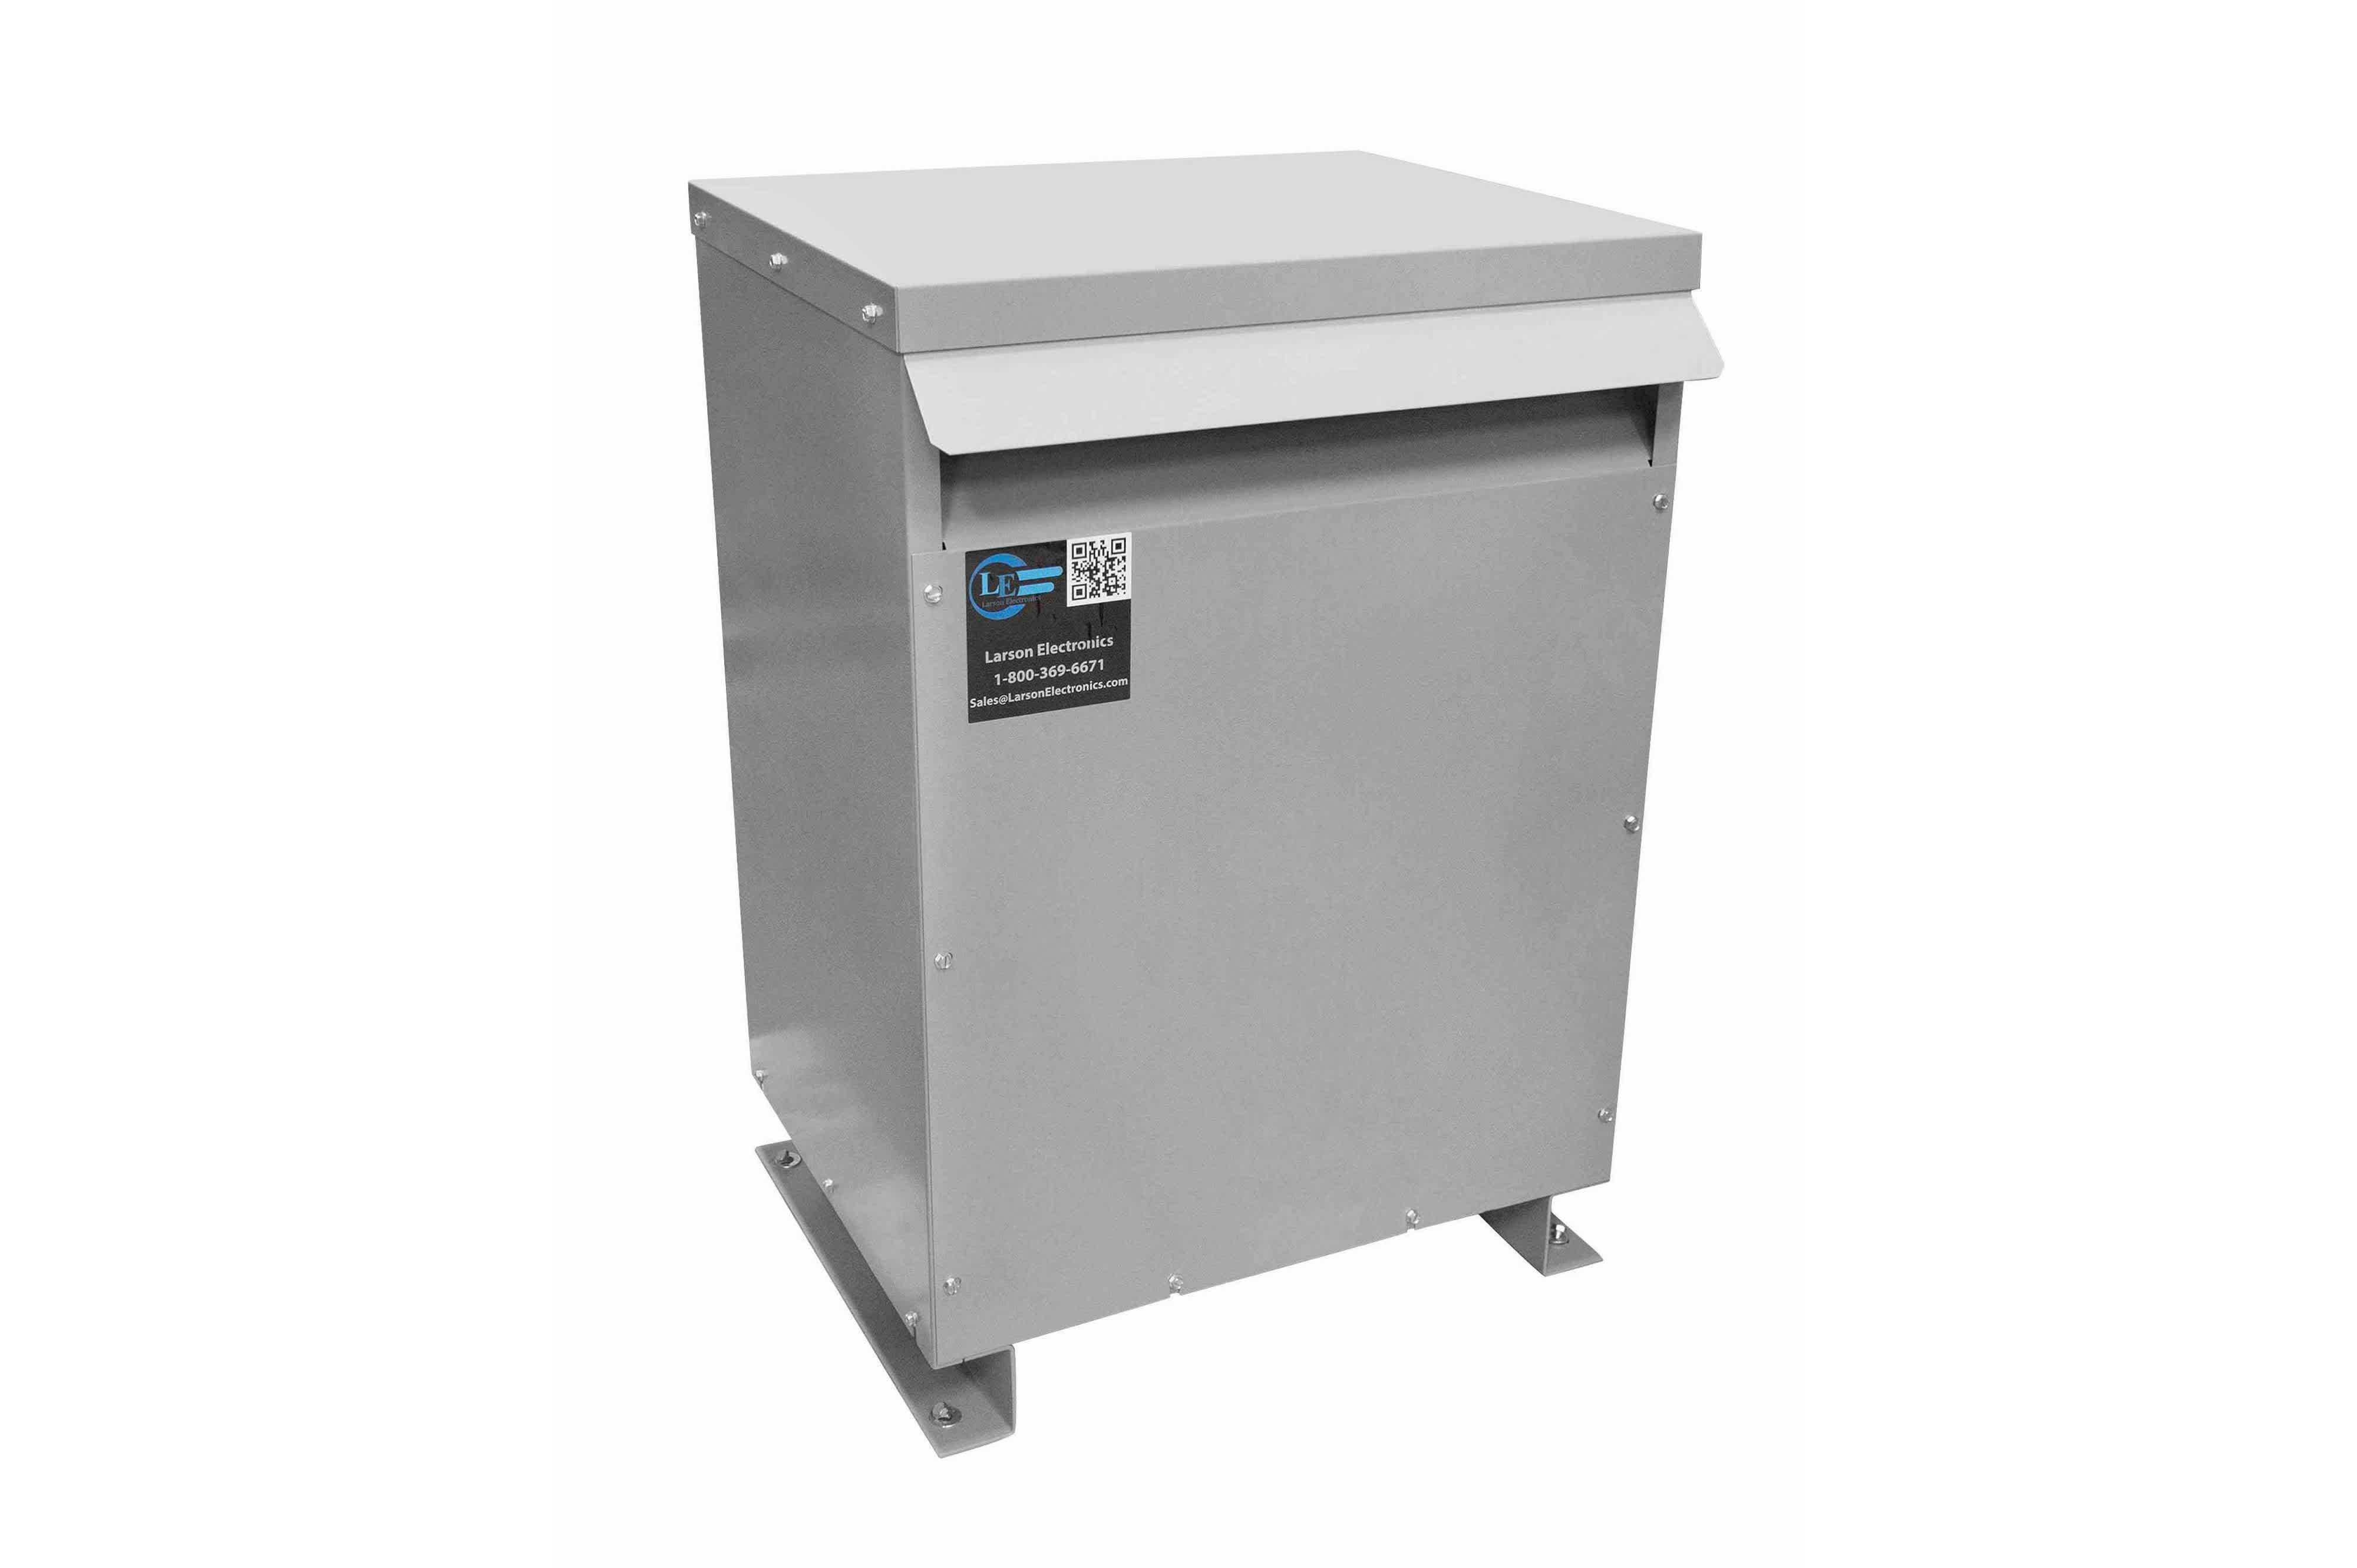 27 kVA 3PH Isolation Transformer, 575V Wye Primary, 380V Delta Secondary, N3R, Ventilated, 60 Hz